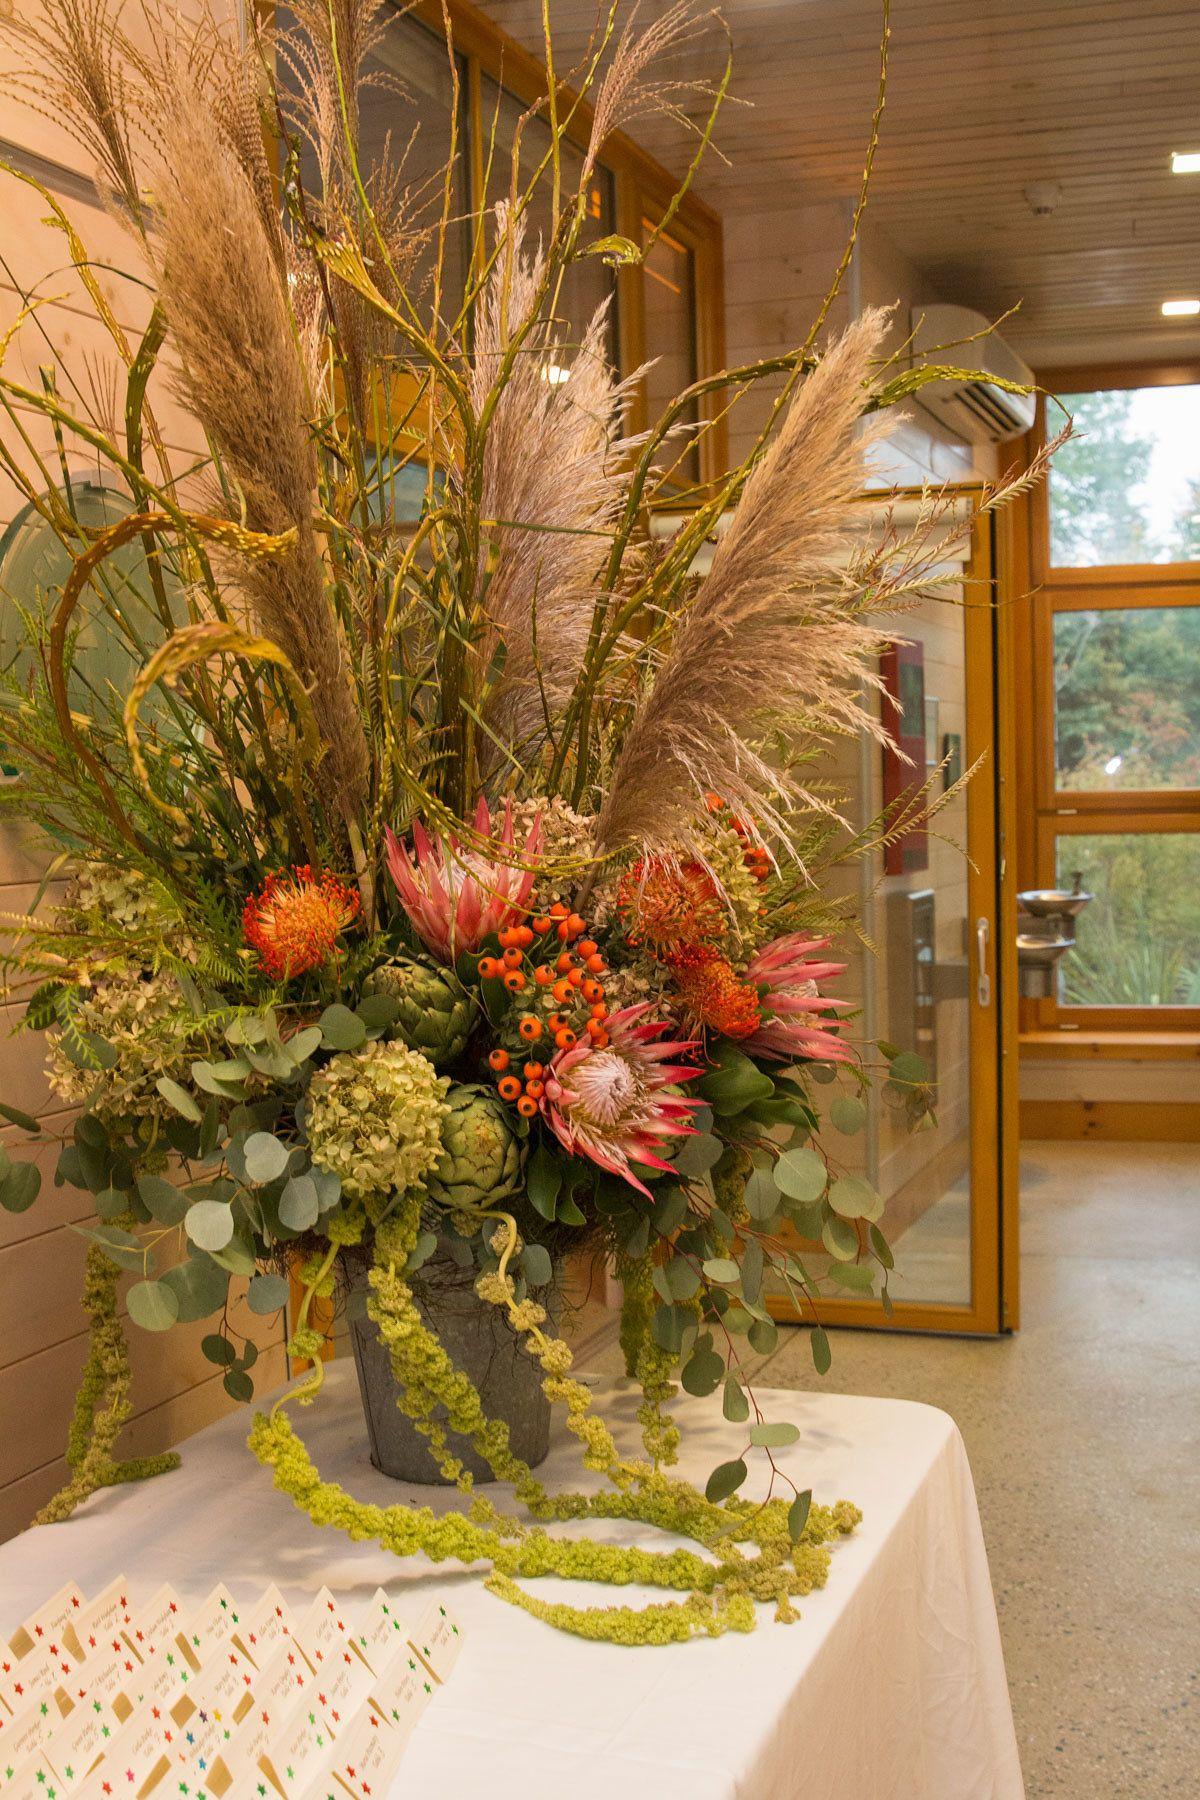 Rustic Arrangement Of King Protea Pampas Grass Fantail Curly Willow Rose Hips Hydrangea Silver Dollar Eucalyptu In 2020 Pretty Flowers Rustic Arrangements Flowers